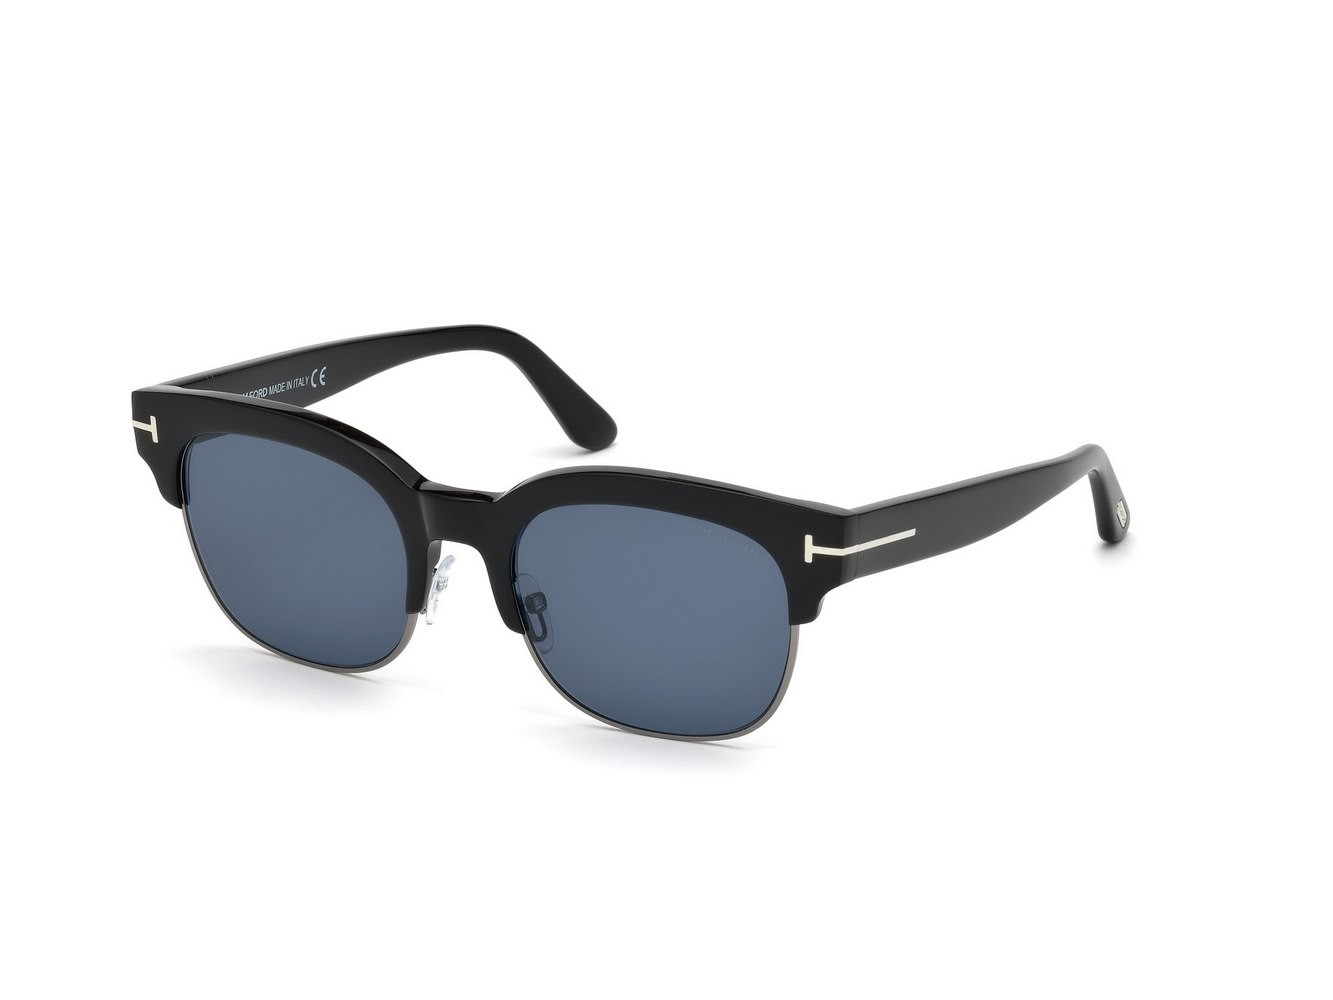 Tom Ford Sonnenbrille » FT0597«, schwarz, 01V - schwarz/blau